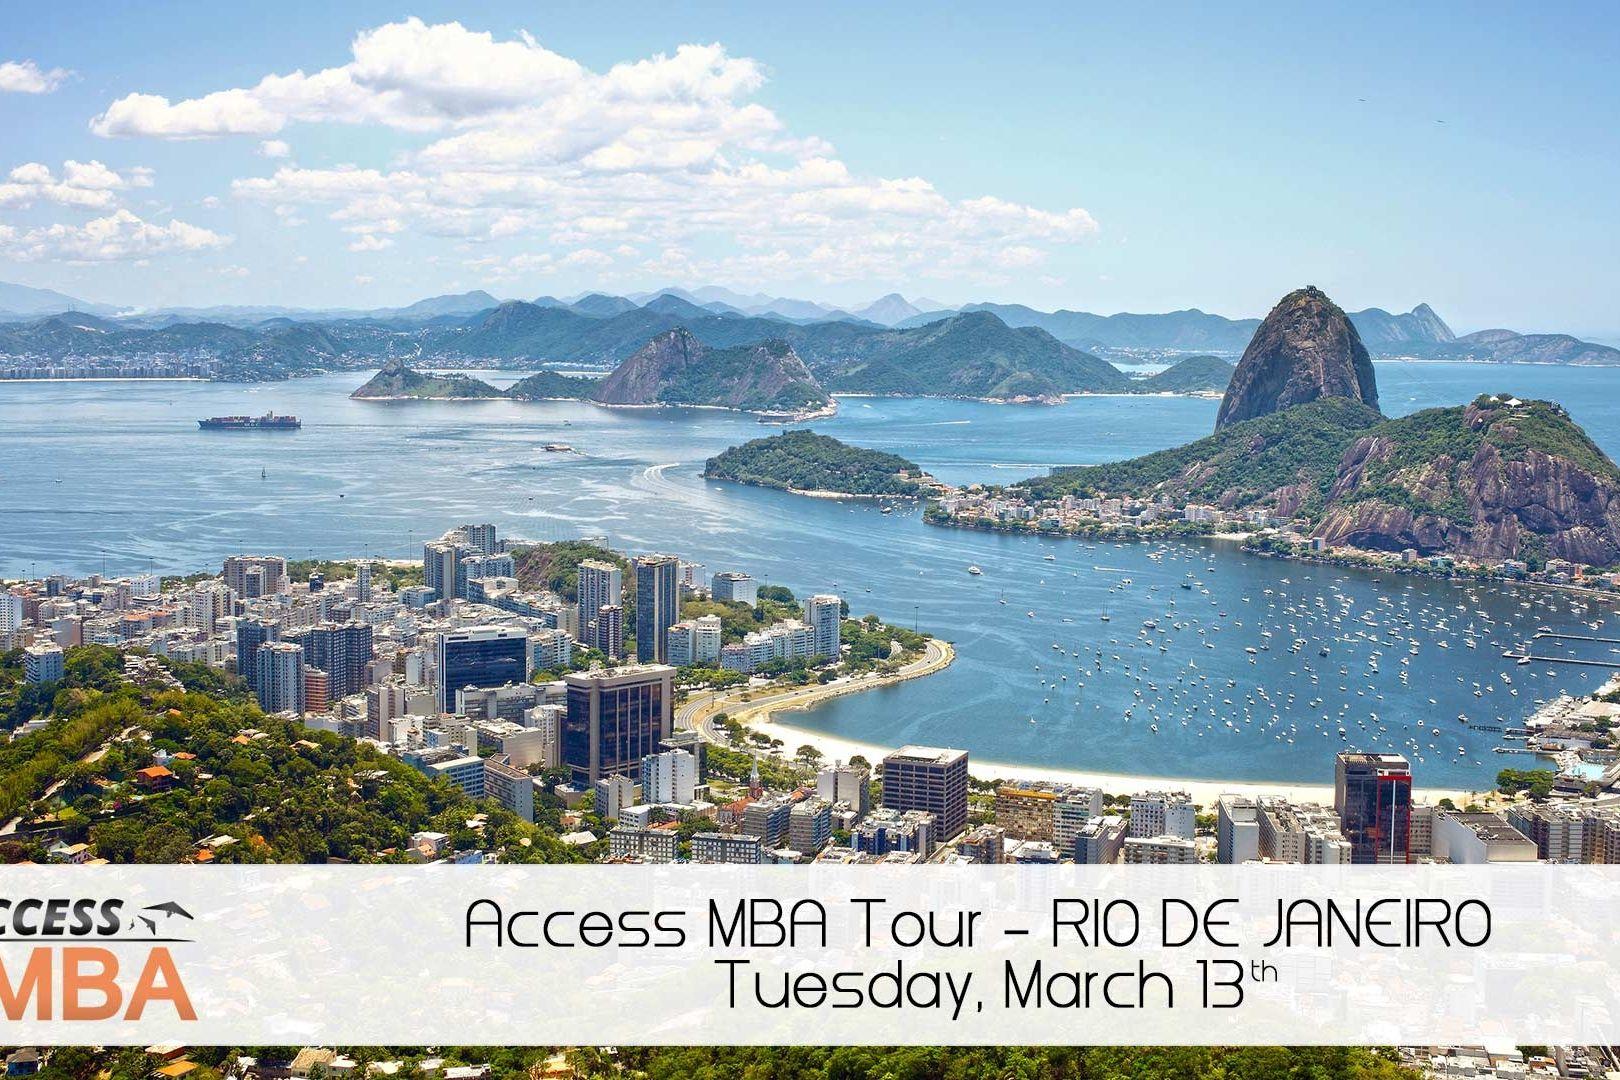 Access MBA Tour RJ 2018